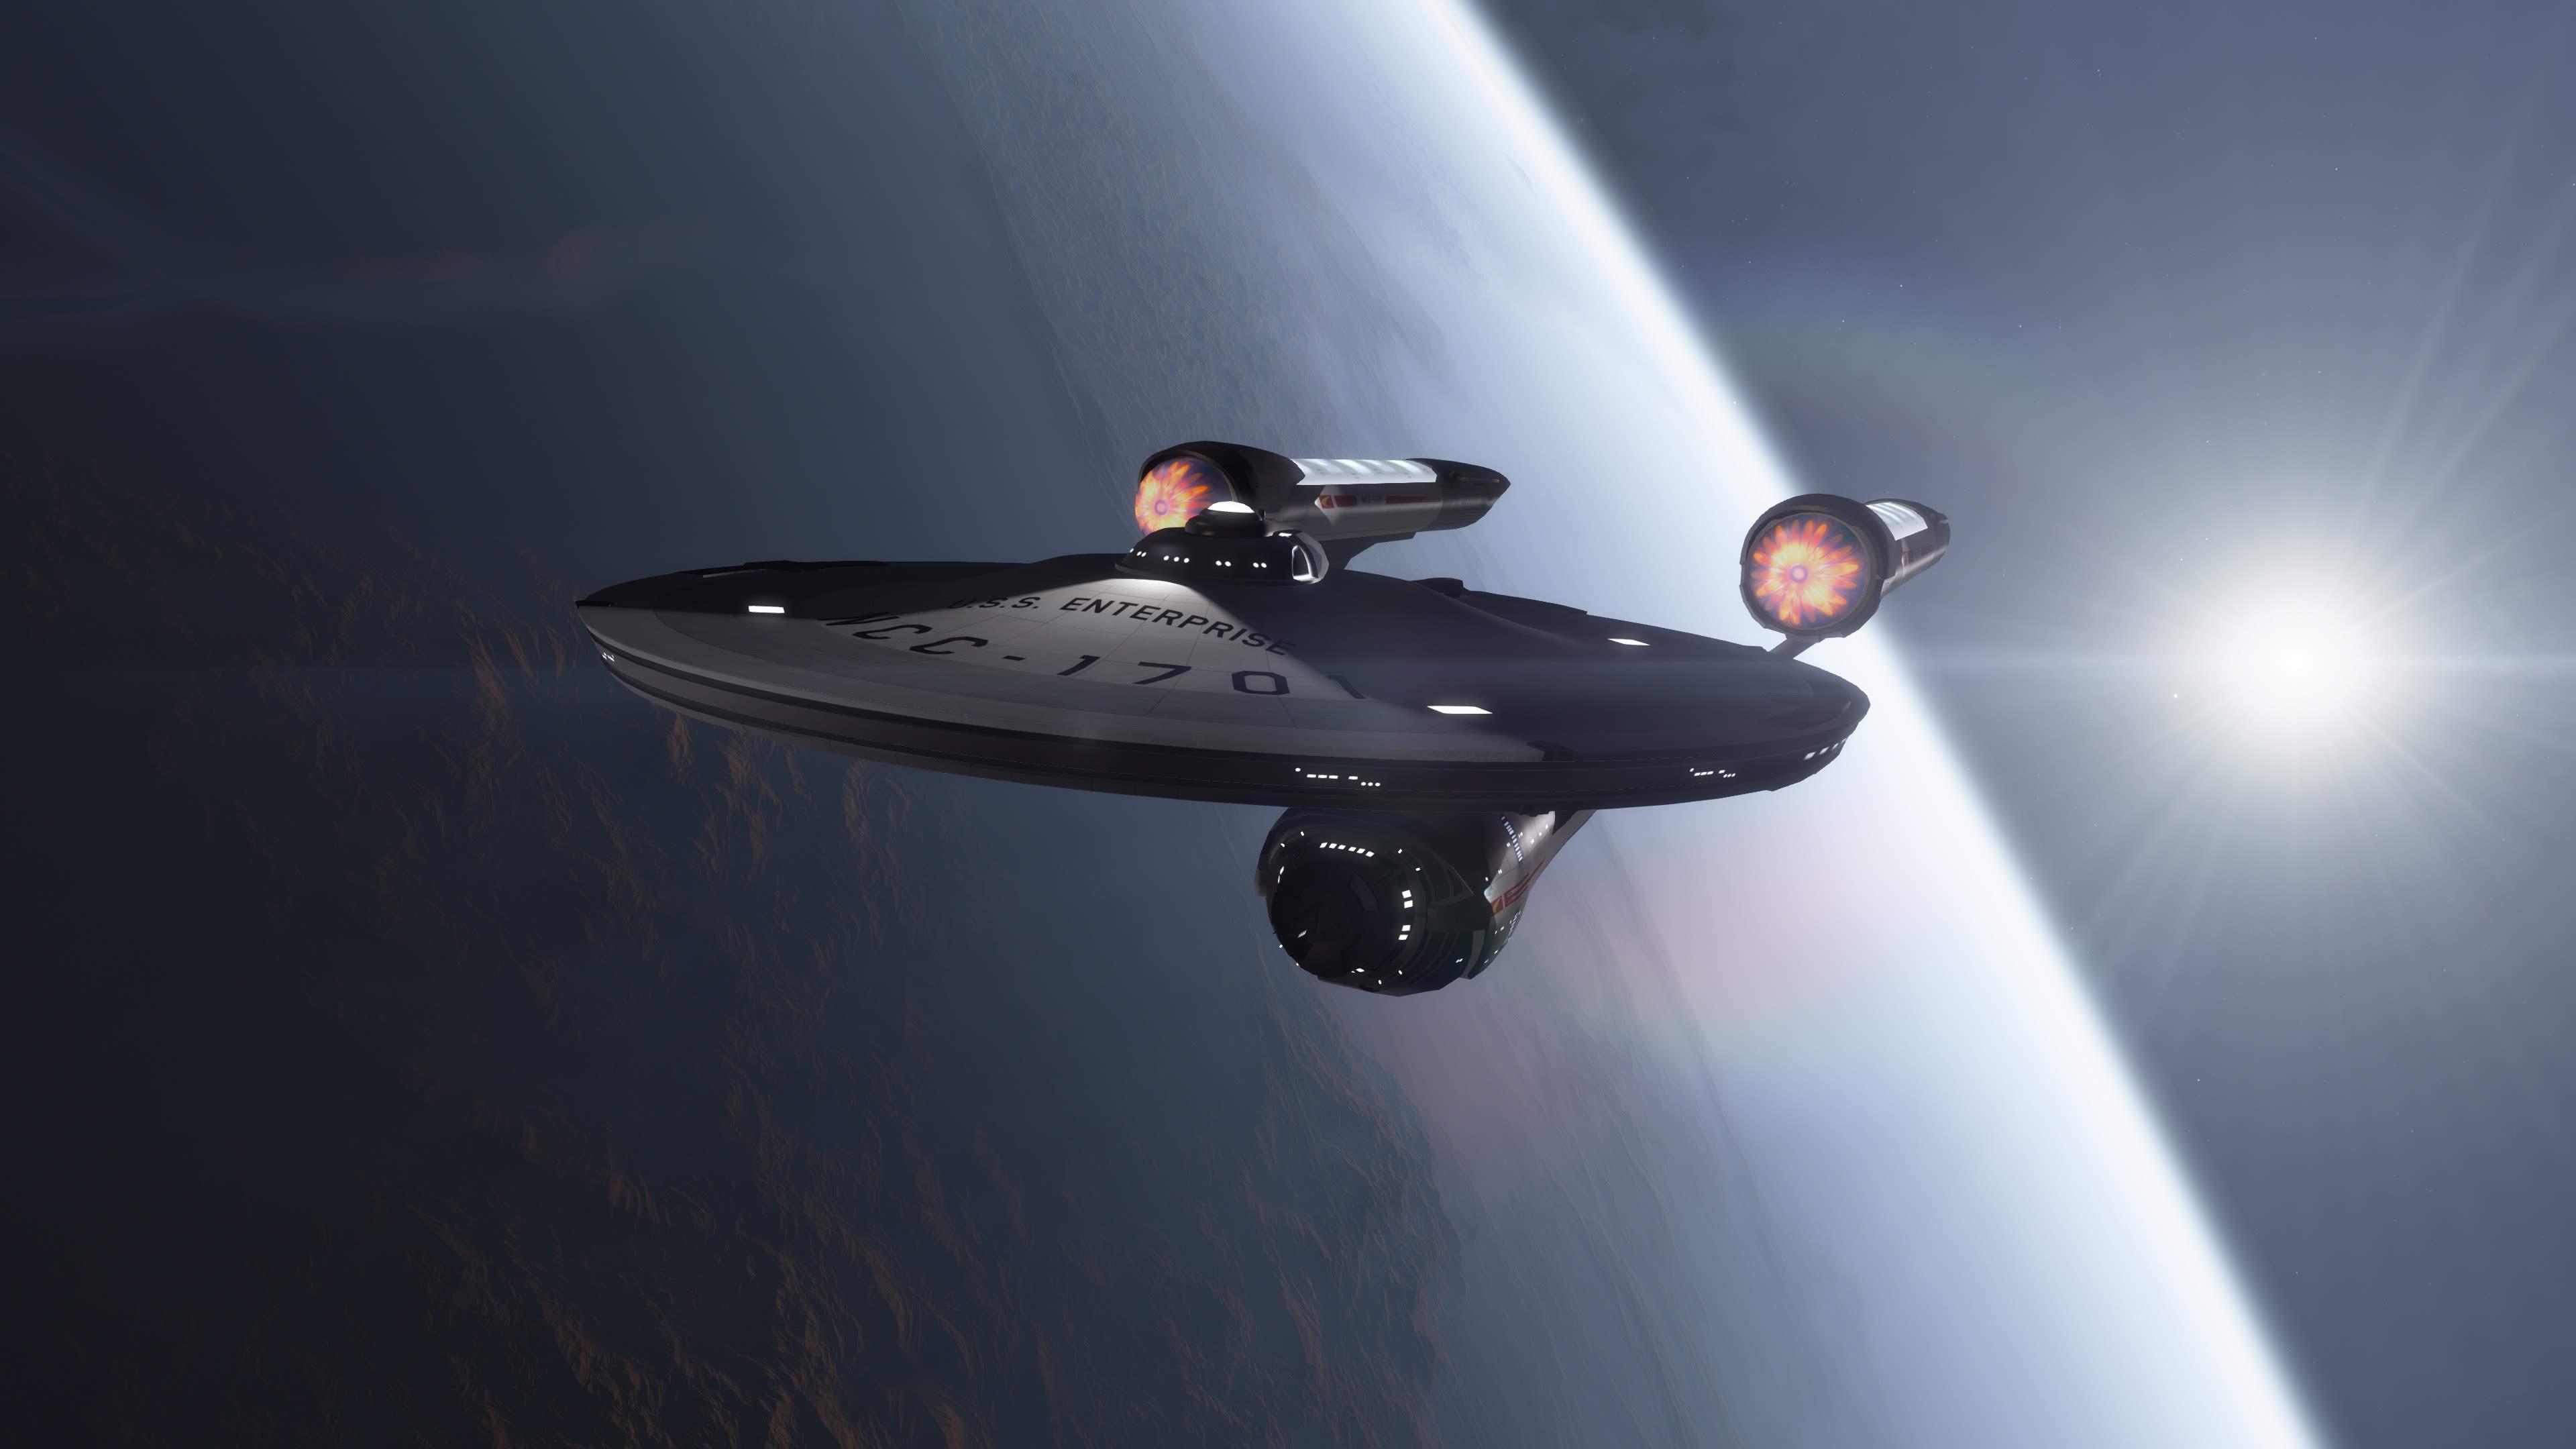 Koerner Enterprise - Star Trek Discovery Enterprise , HD Wallpaper & Backgrounds